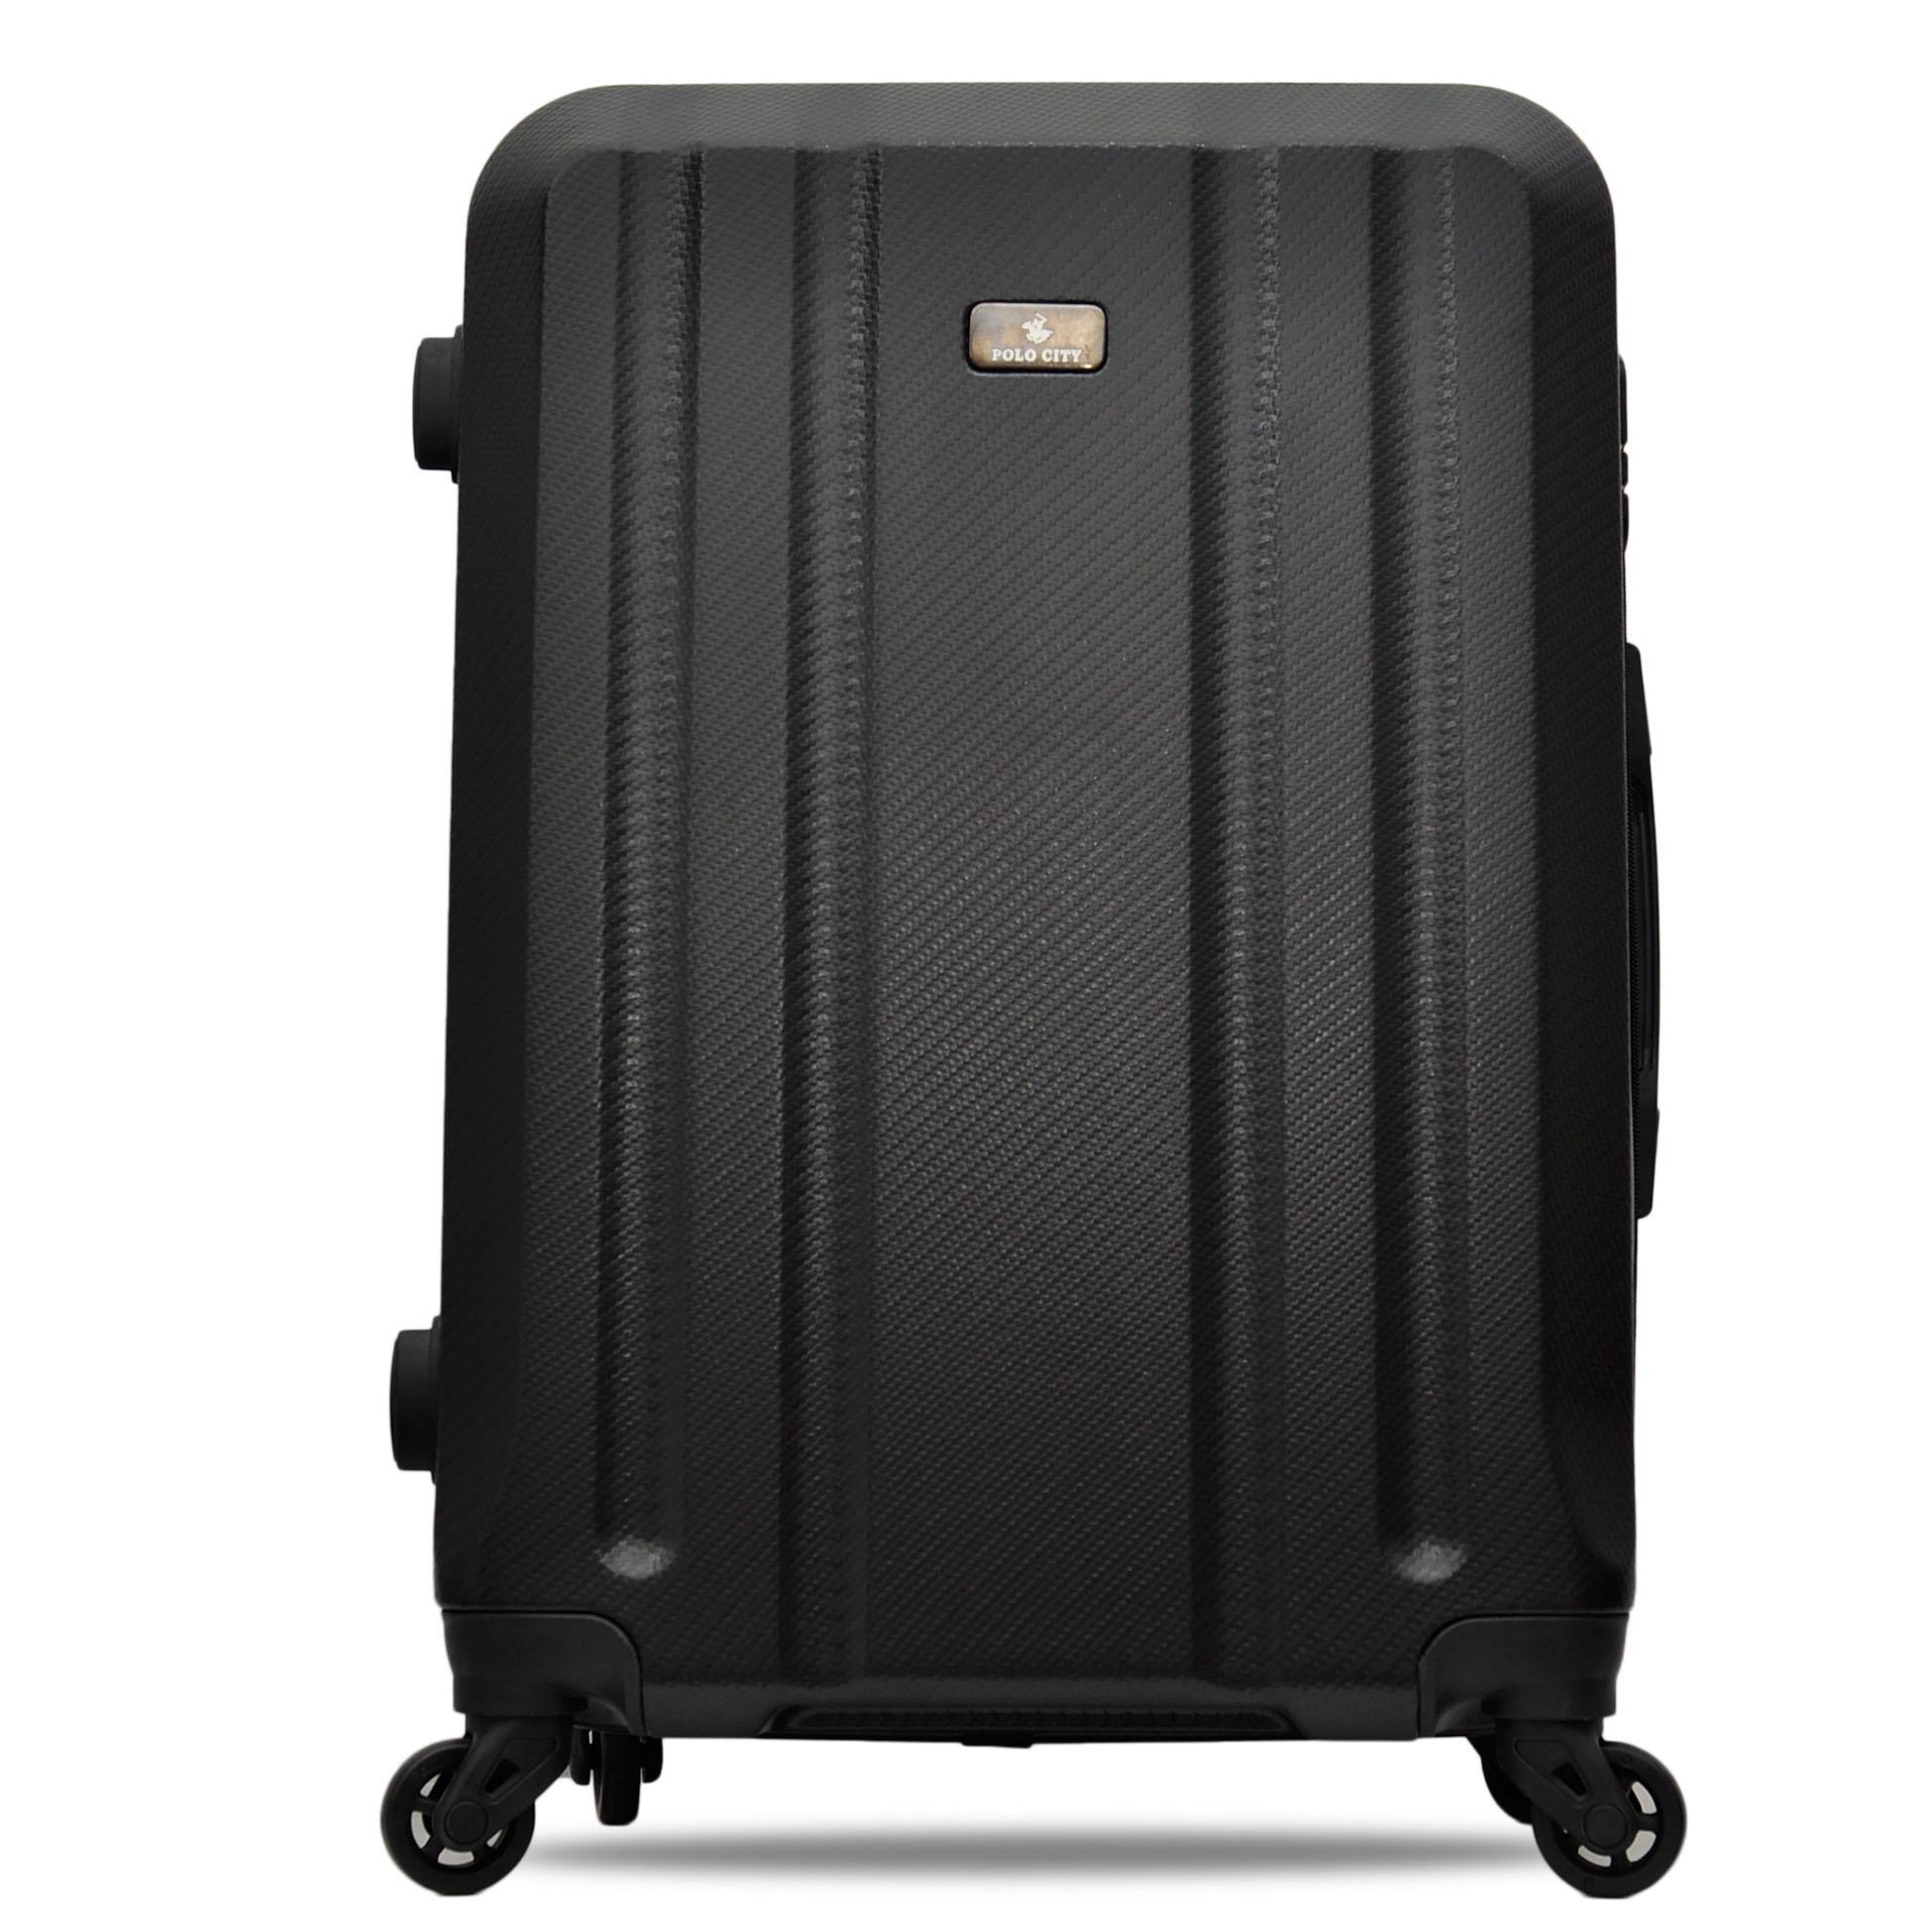 Polo City Tas Koper Hardcase Kabin Size 20 inch - 304 c95039650e